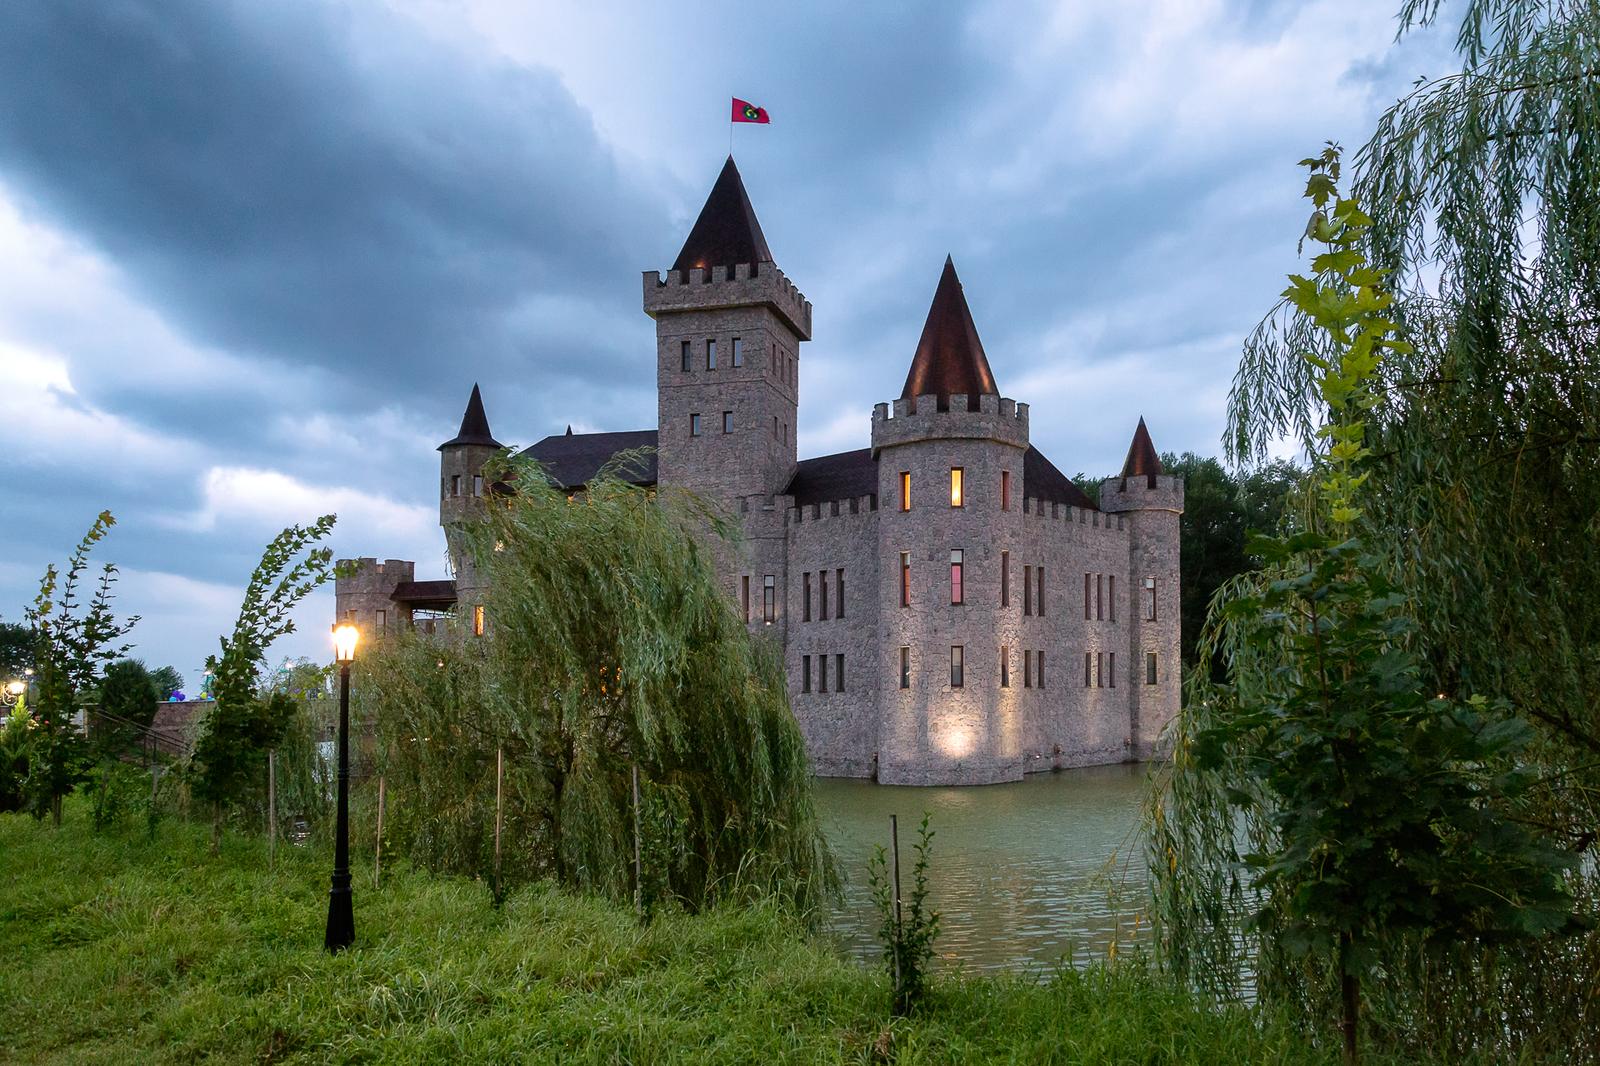 Замок на воде Шато Эркен КБР, г. Нальчик.